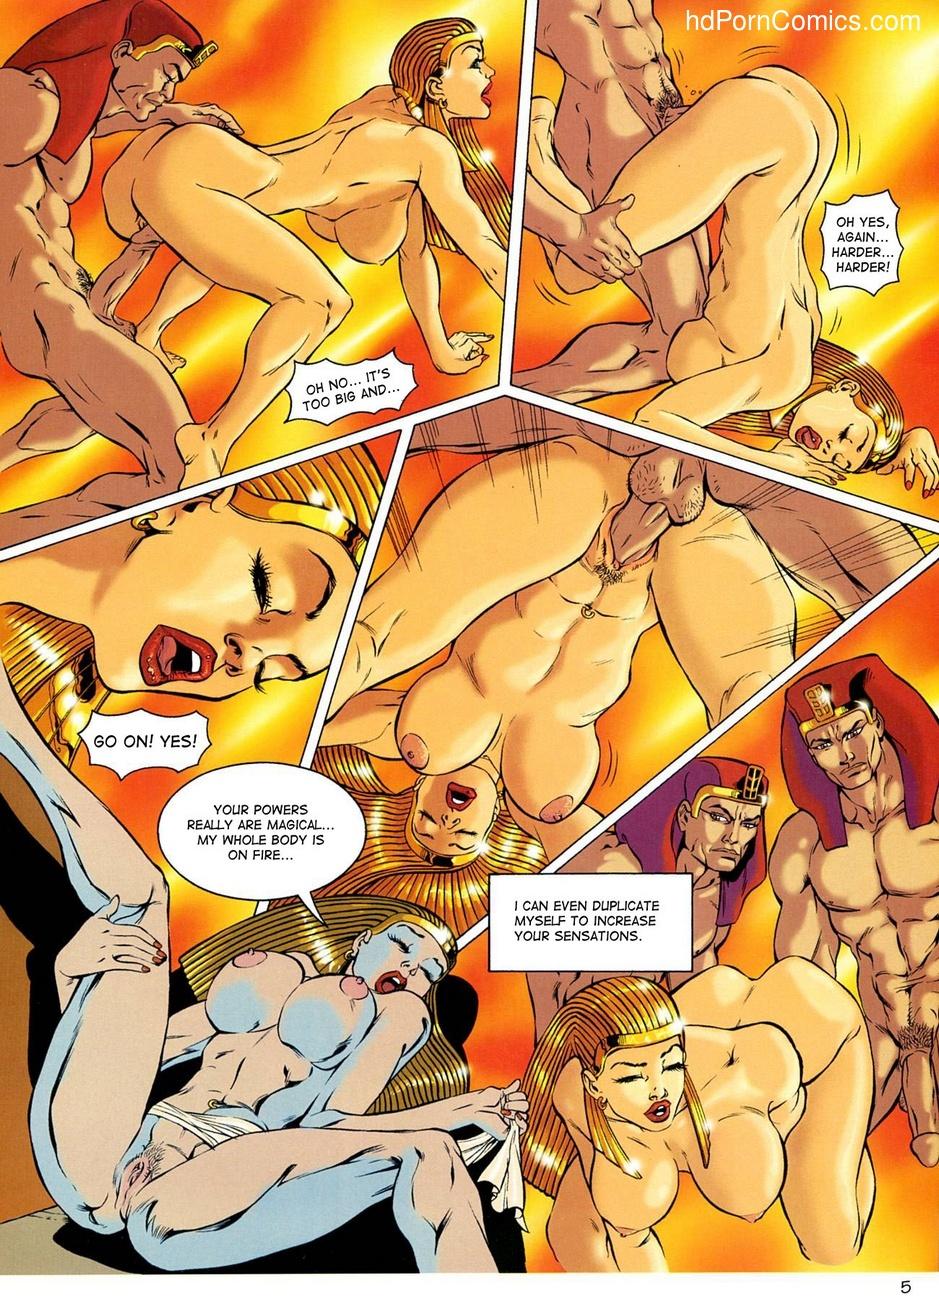 lara jones comics xxx